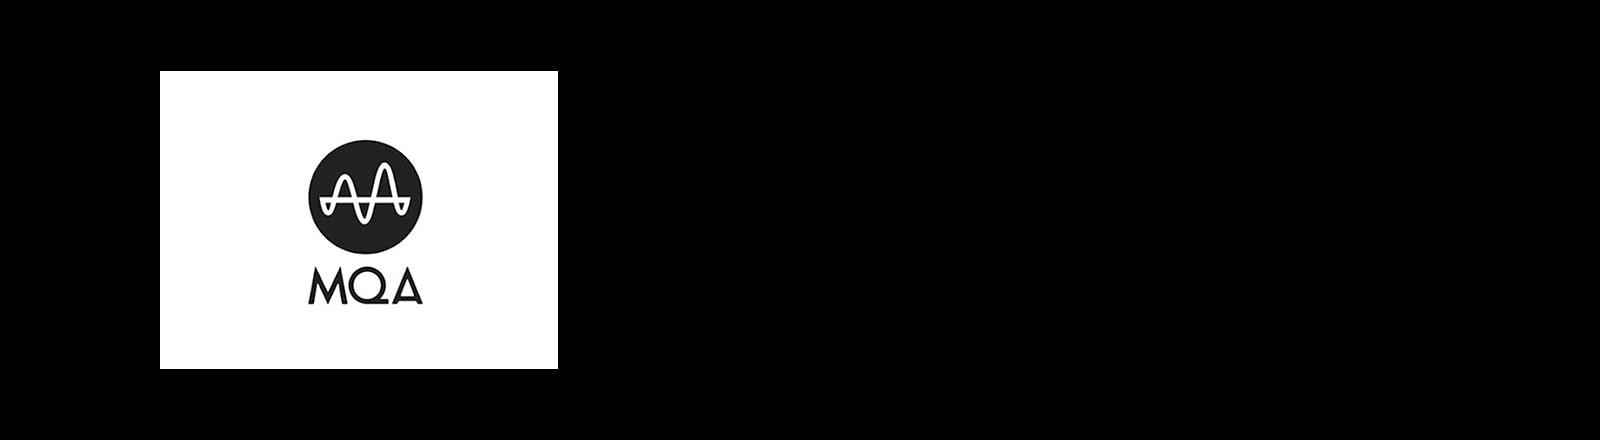 "Slika logotipa ""MQA"""